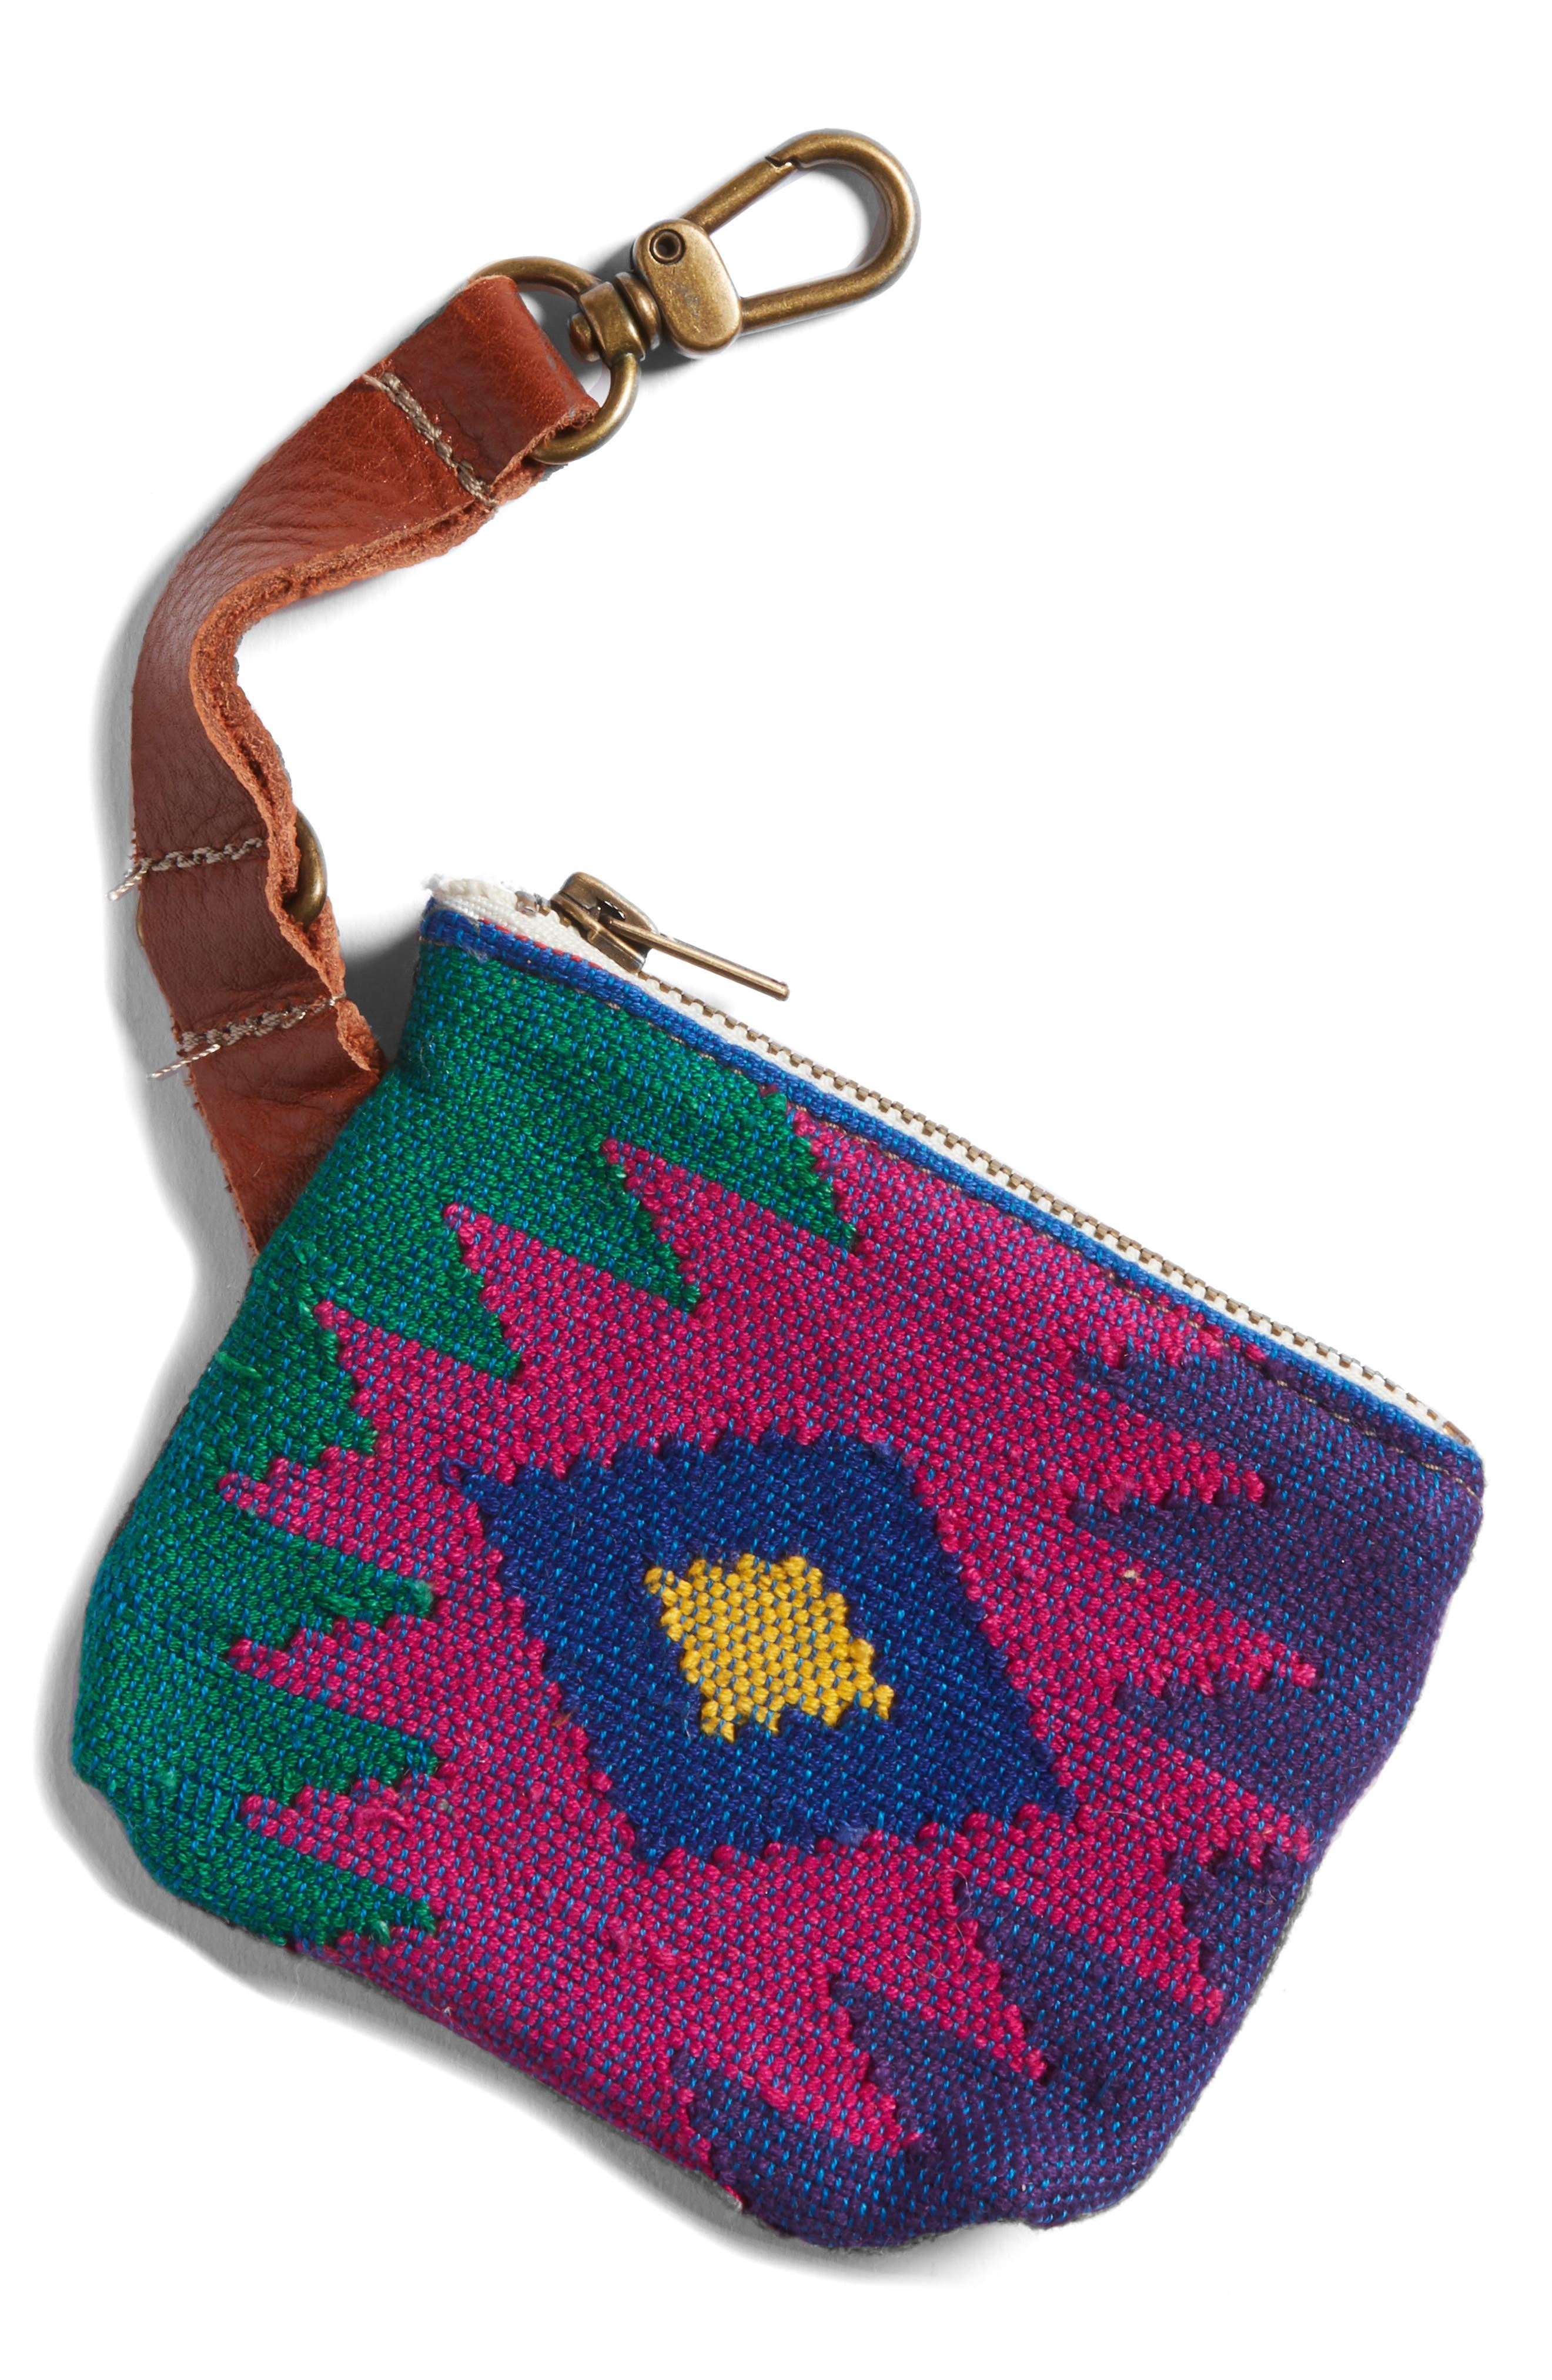 Oaxaca Sunburst Waste Bag Pouch,                         Main,                         color, 960